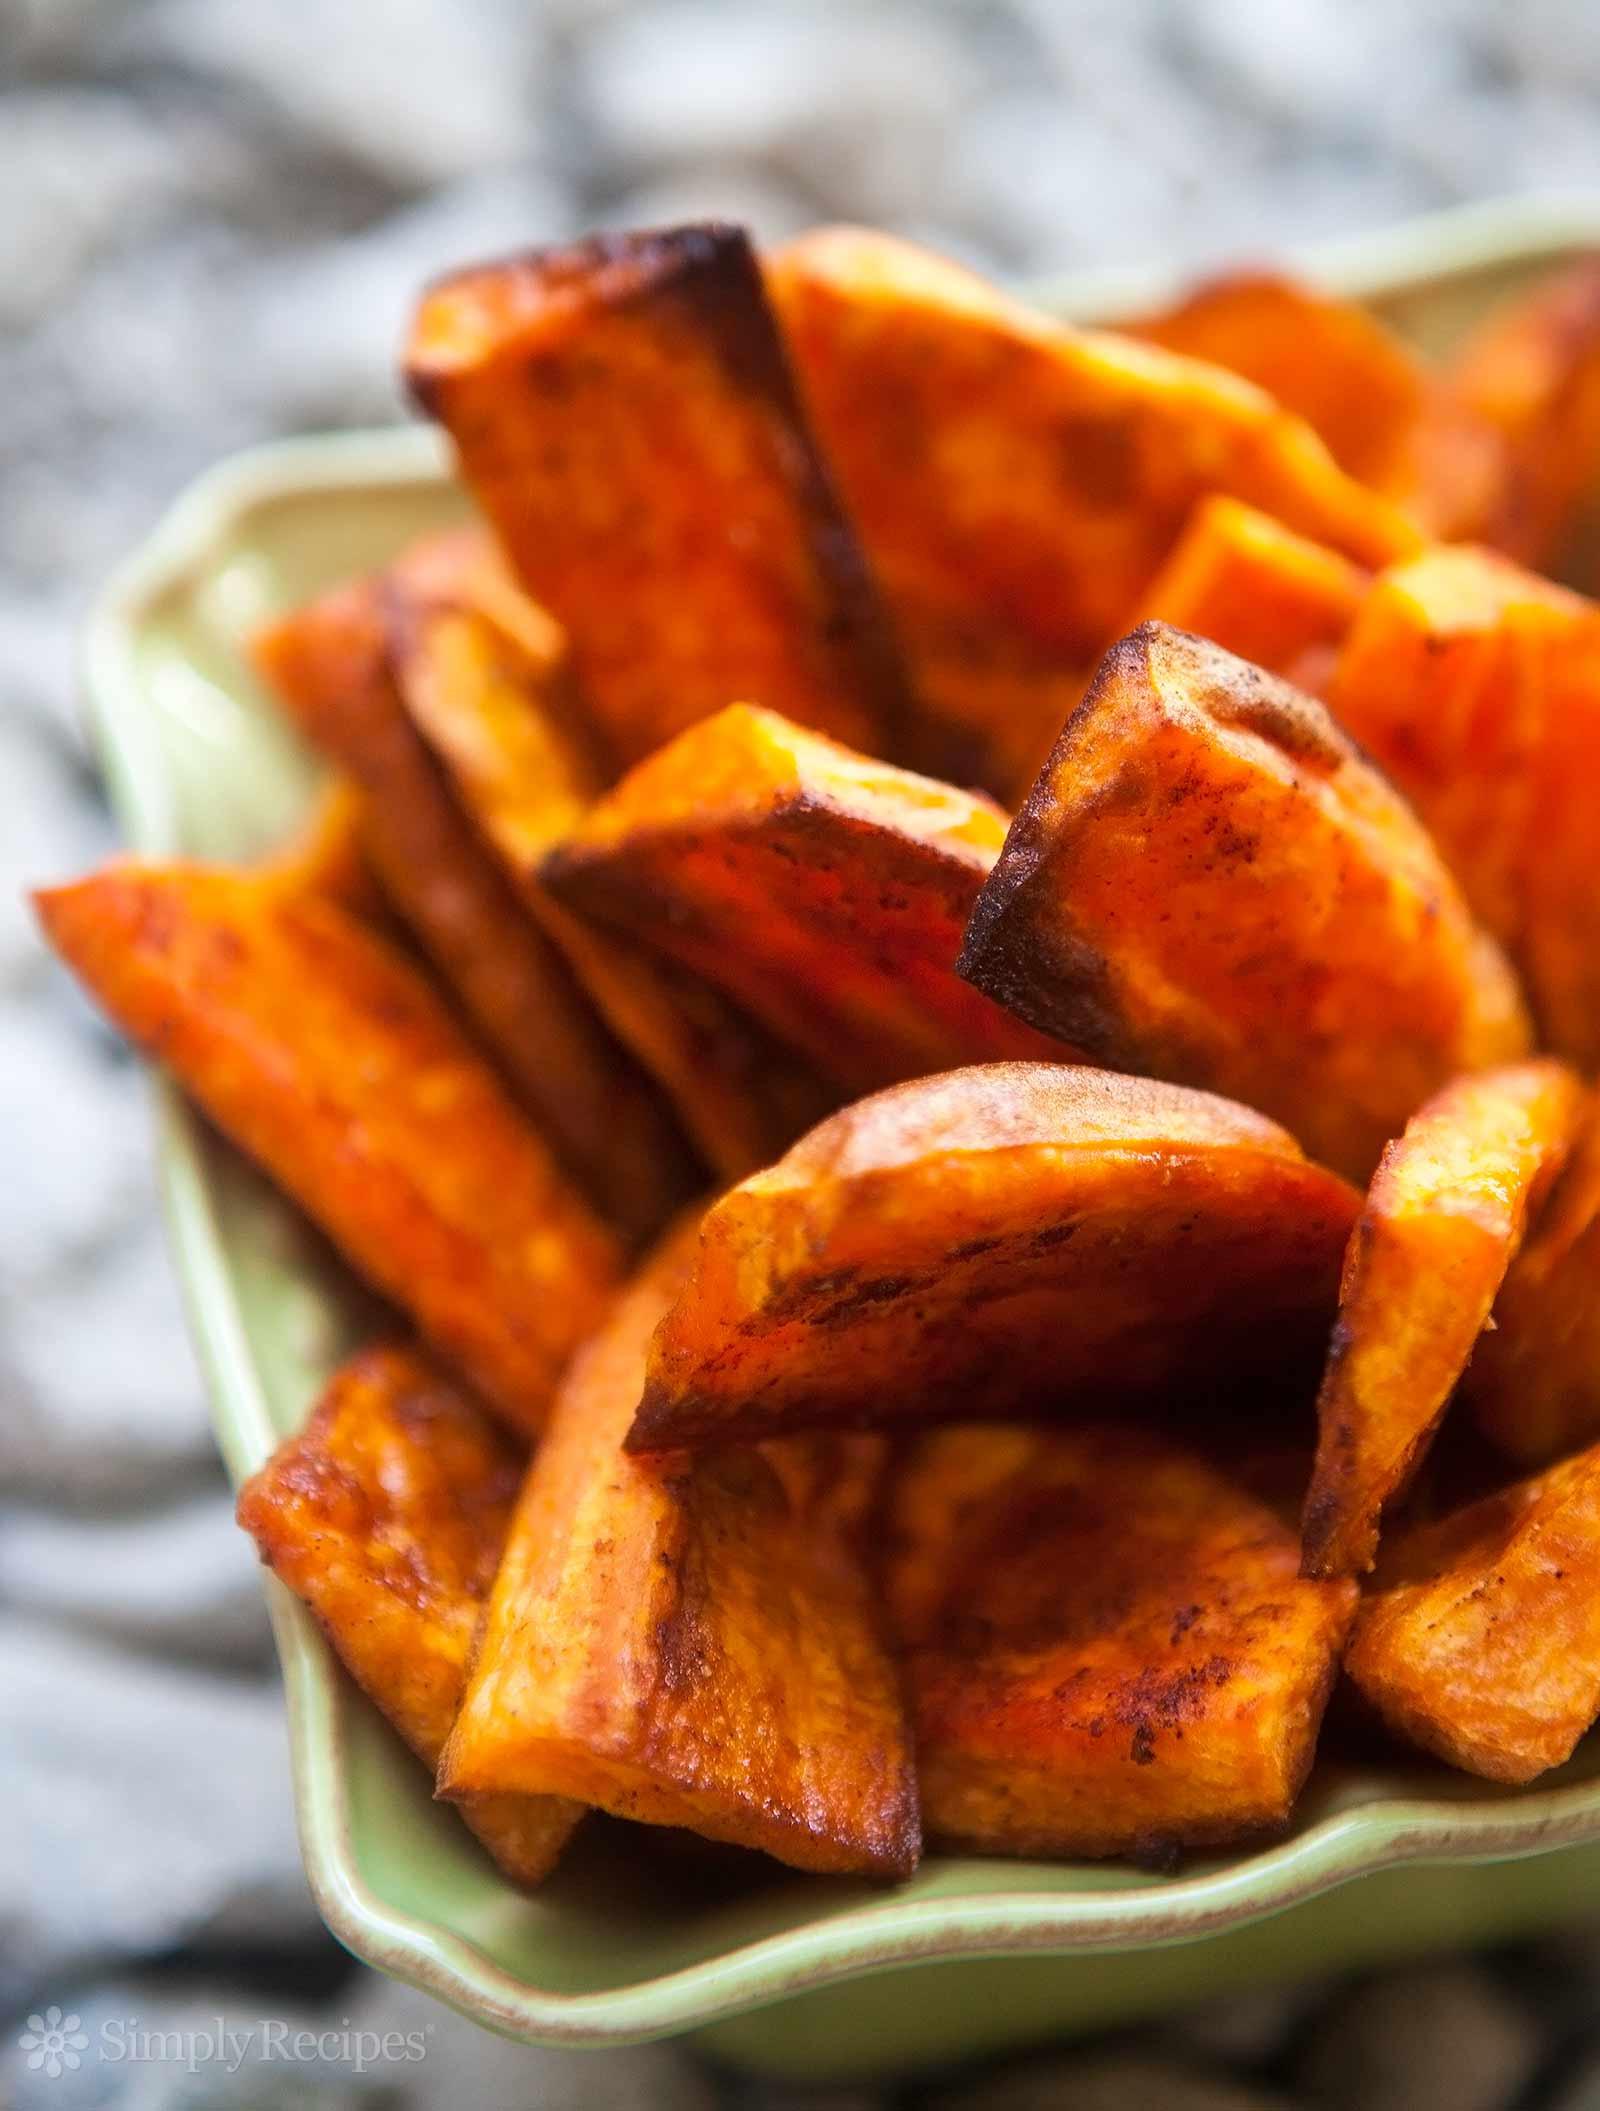 Baked Sweet Potato Recipes  Oven Baked Sweet Potato Fries Recipe